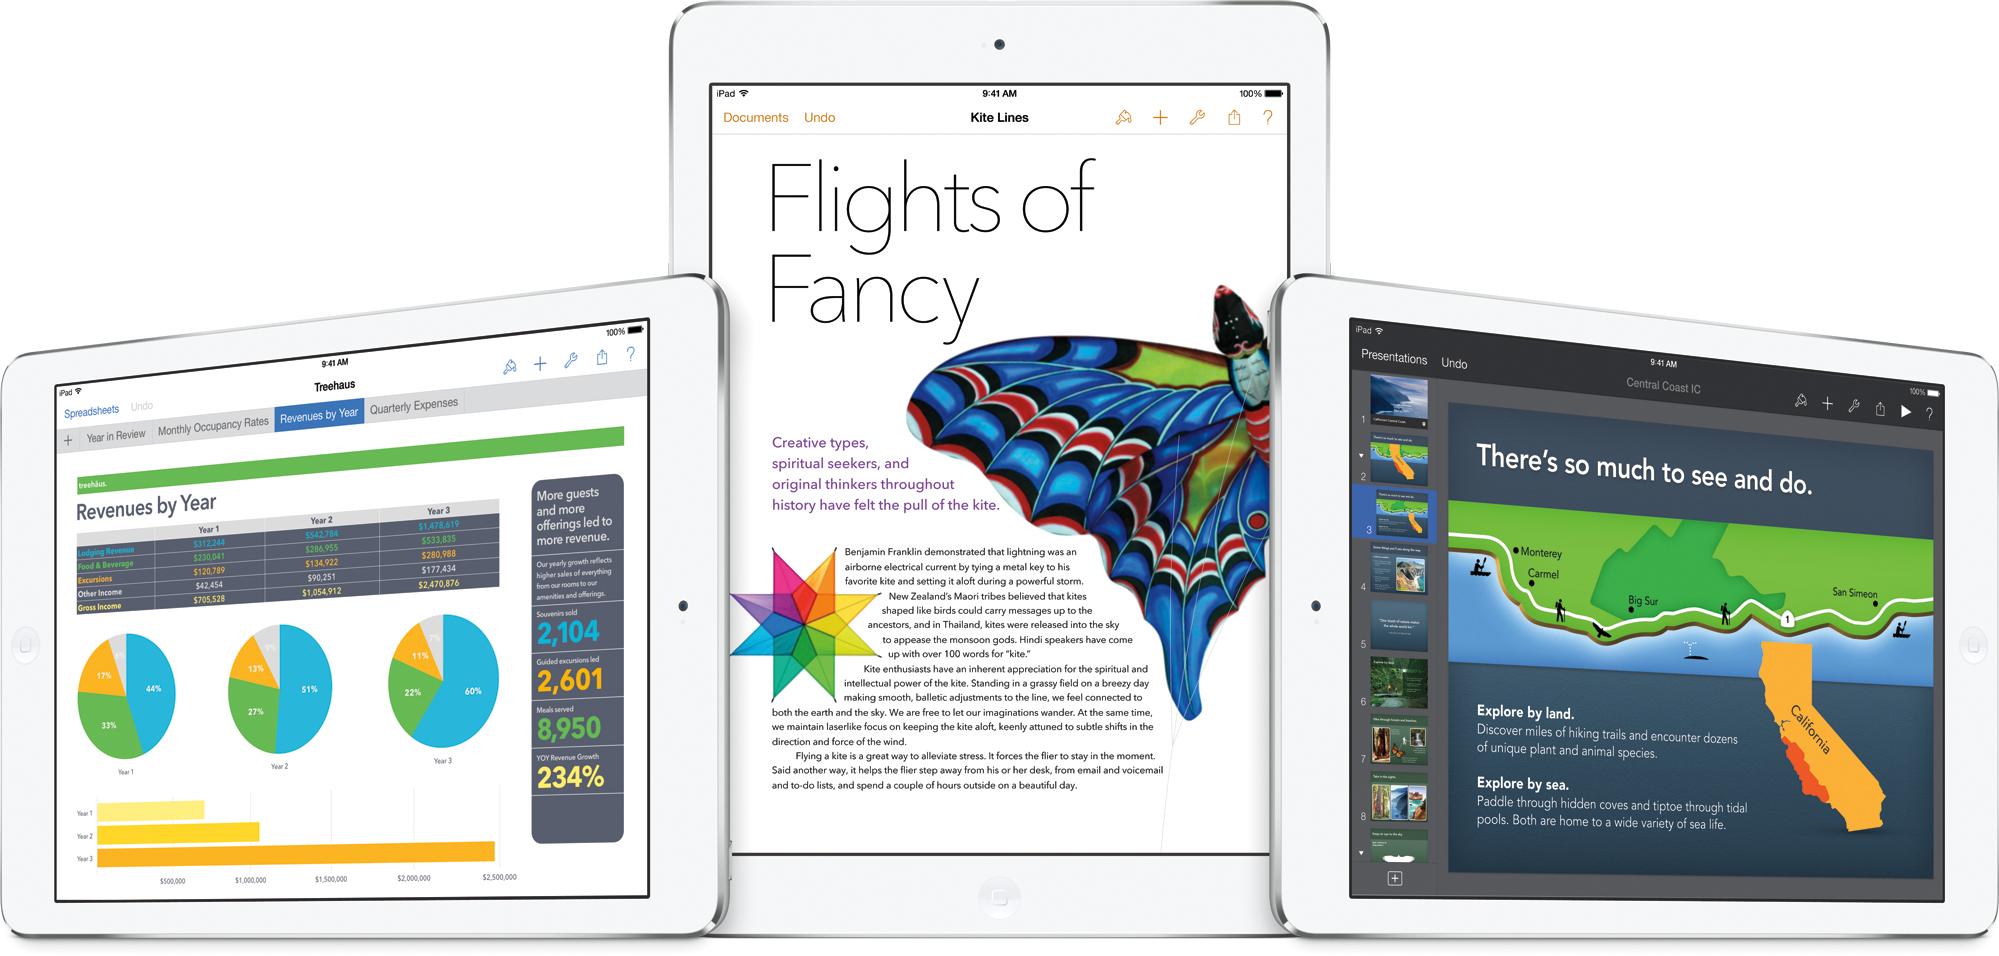 Nova suíte iWork em iPads